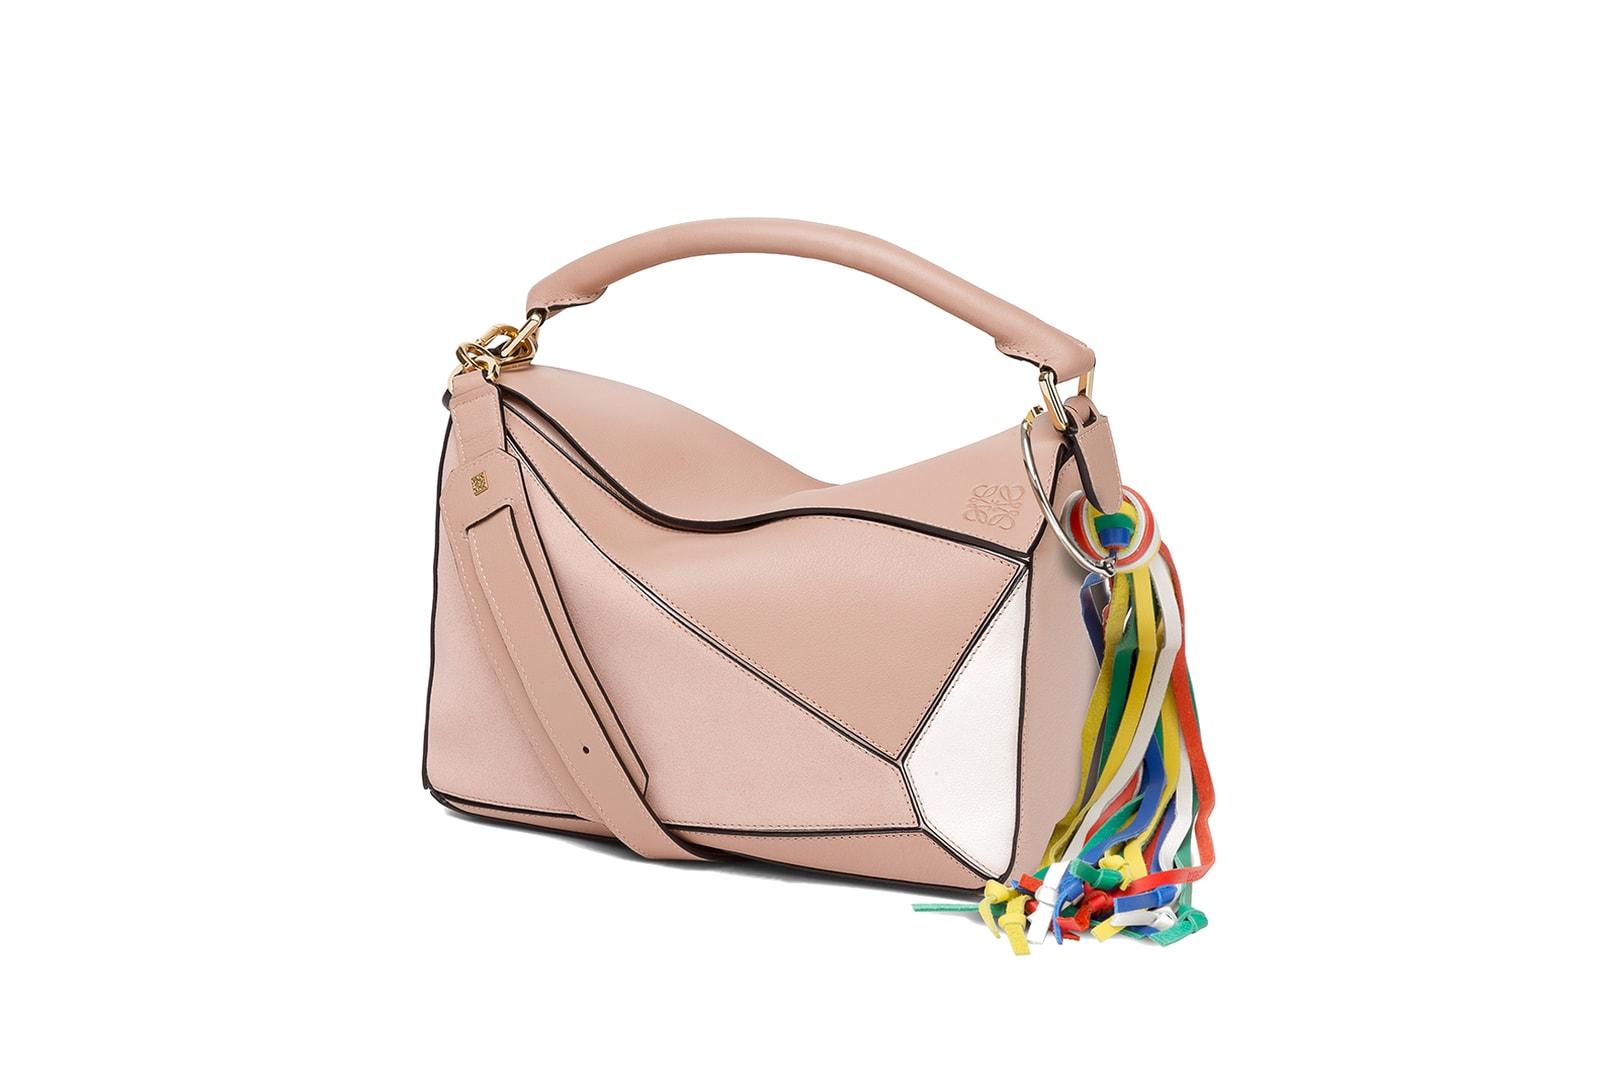 Luxury Brands Customization and Monogram Service Gucci Dior Louis Vuitton Loewe Burberry Dior Tote Print Pattern Longchamp